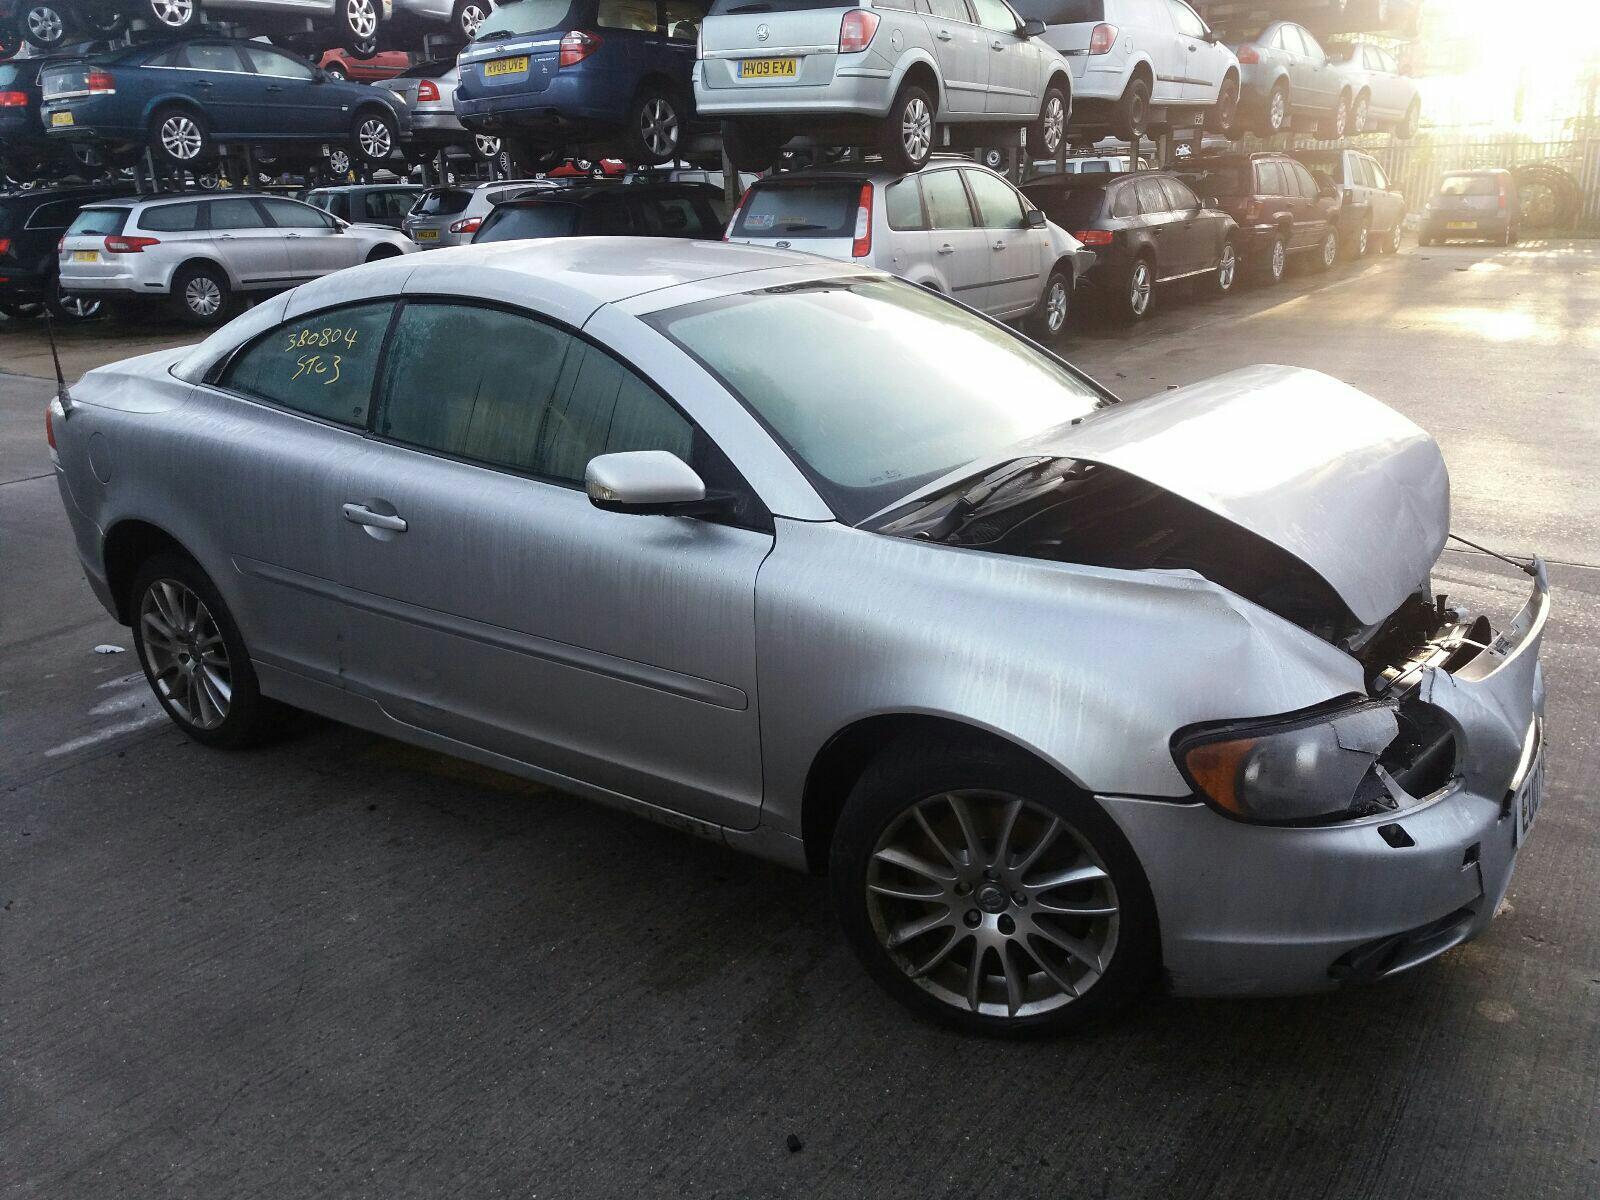 hight resolution of volvo c70 2006 to 2009 se 2 door cabriolet scrap salvage car for sale